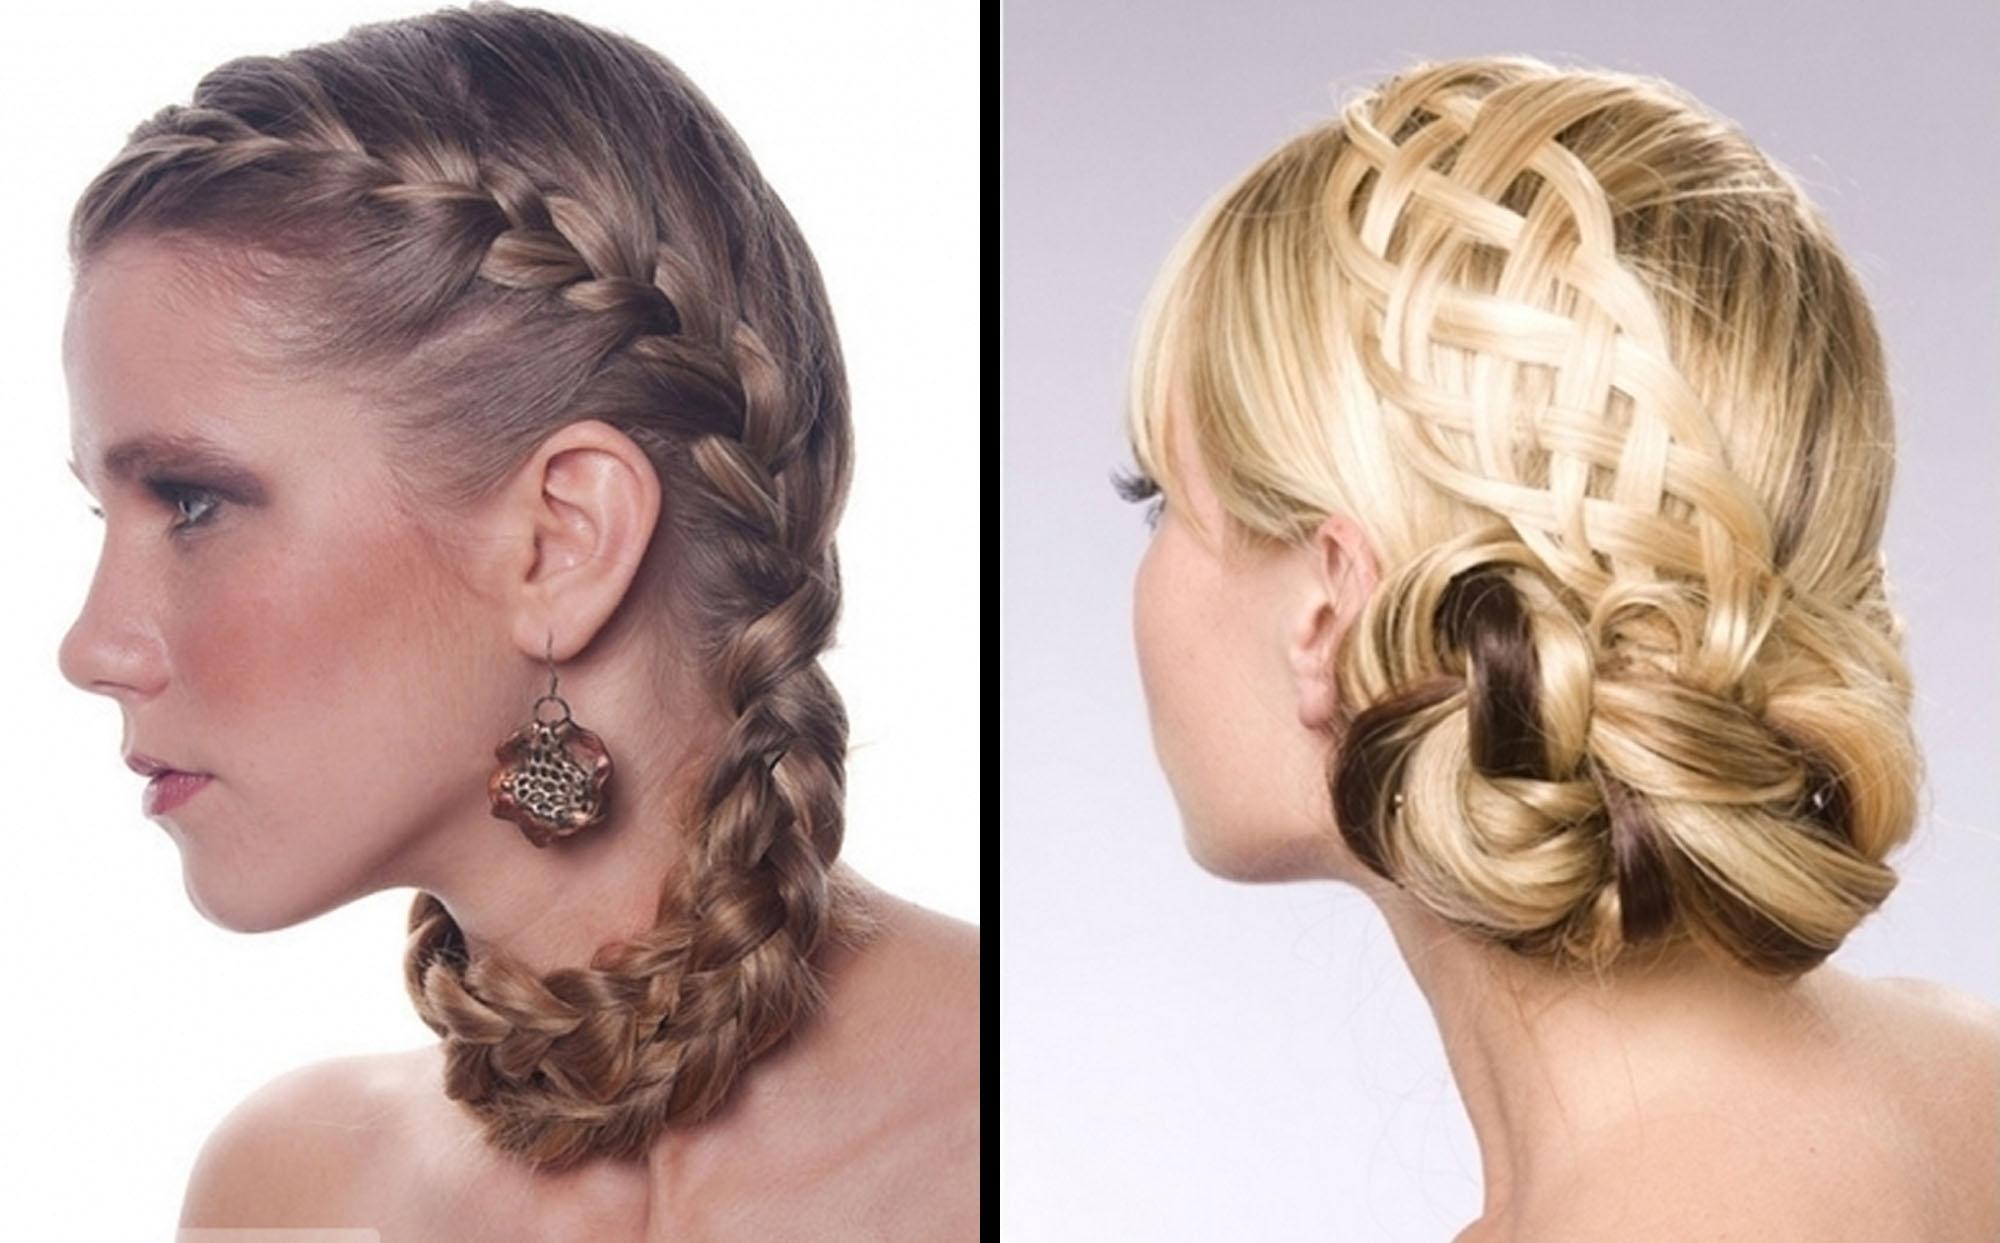 Hair Braided Updo Hairstyles Salon Formal | Medium Hair Styles Ideas With Regard To Braided Hair Updo Hairstyles (View 5 of 15)